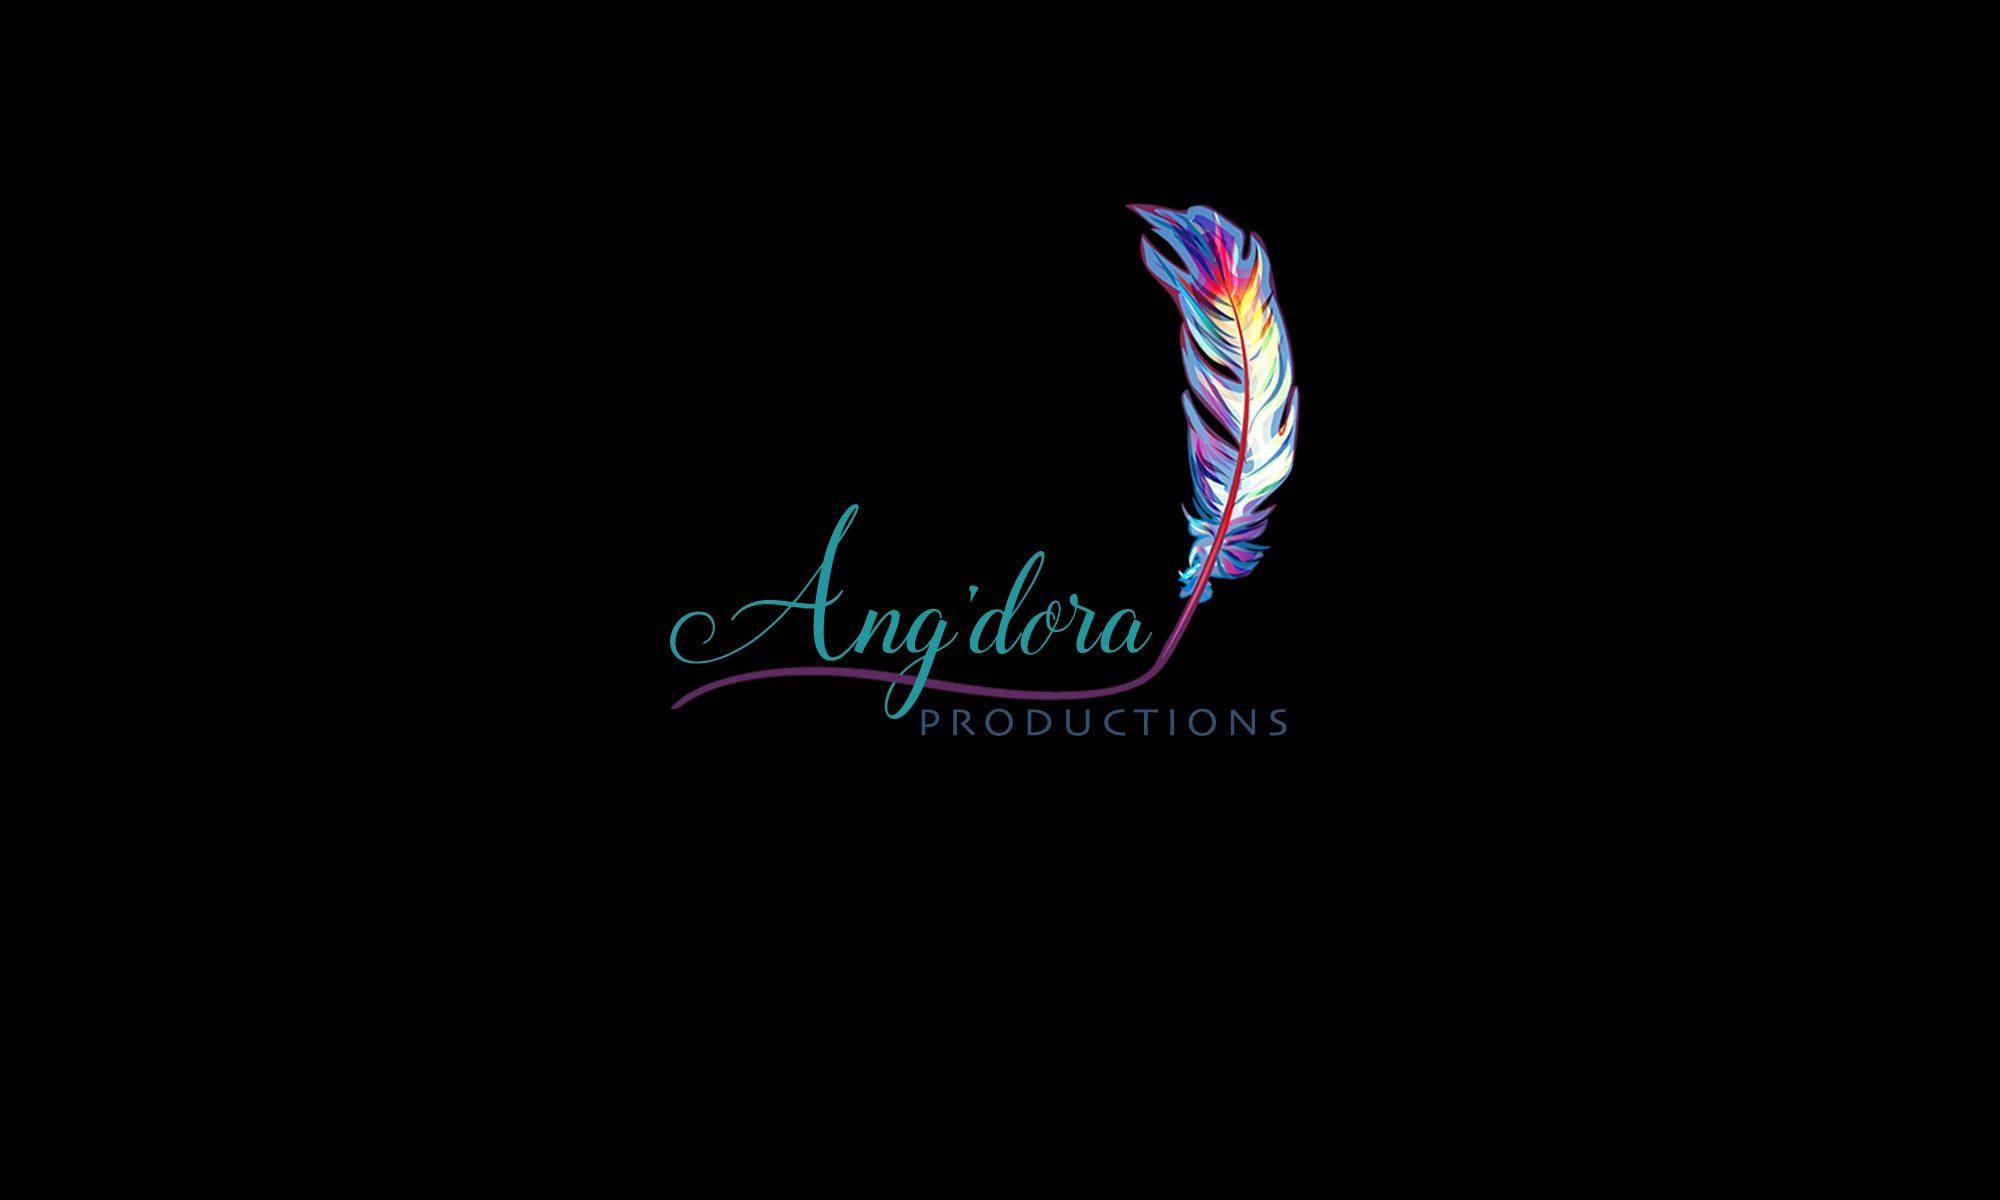 Ang'dora Productions LLC